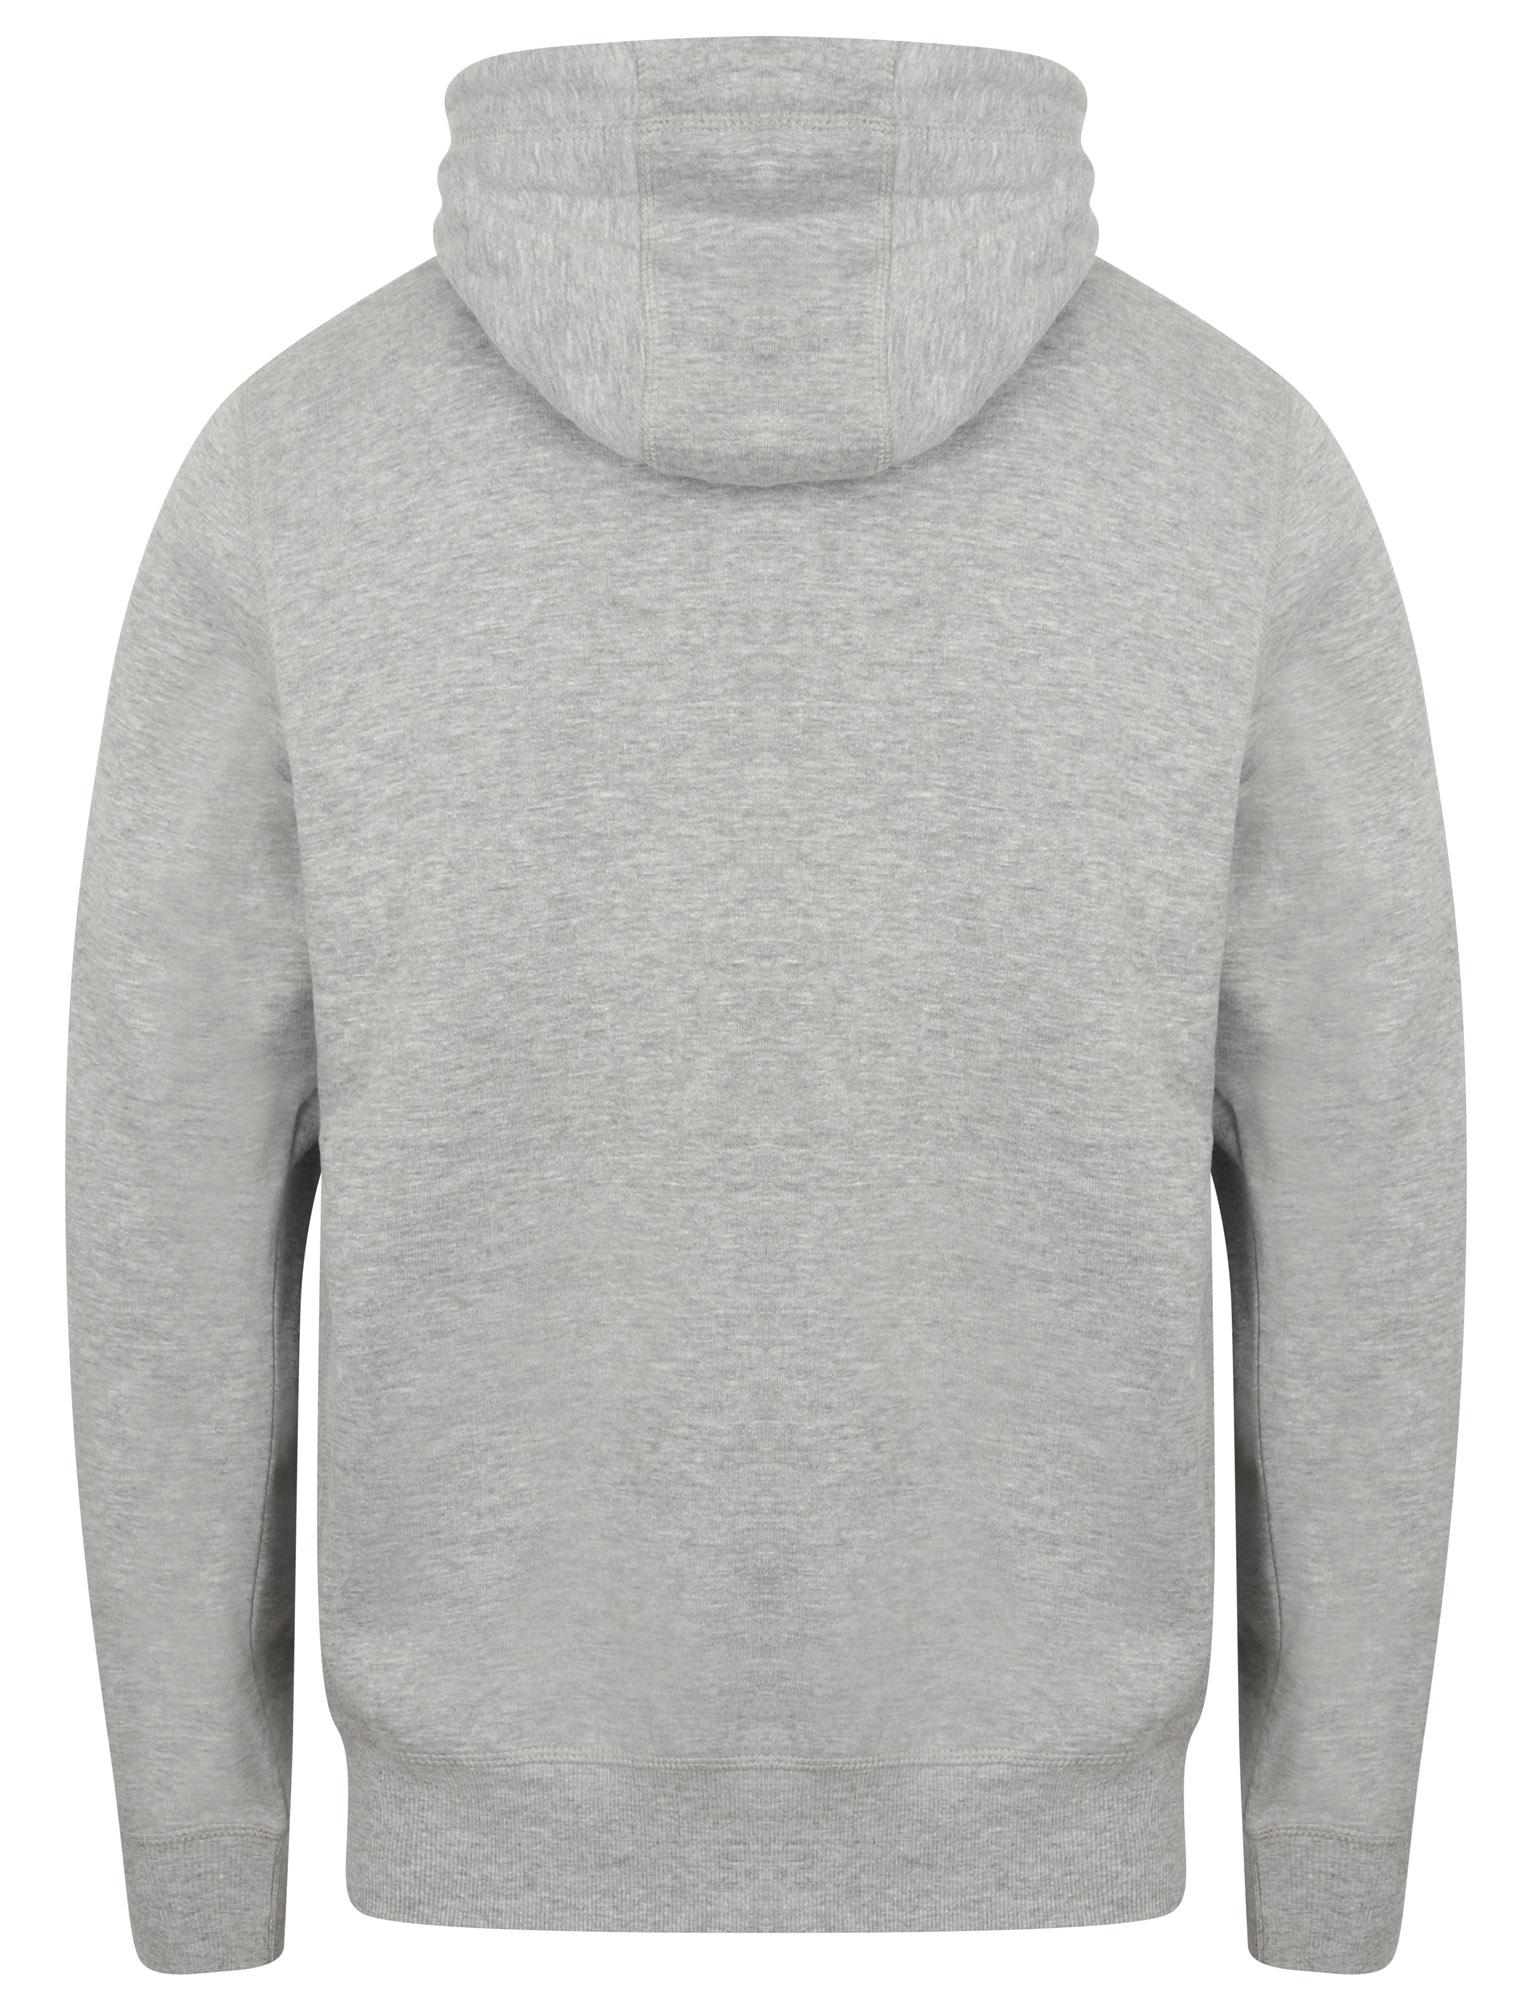 Tokyo-Laundry-Men-039-s-Harper-Zip-Up-Hoodie-Hooded-Top-Sweatshirt-Sweater-Jacket thumbnail 3